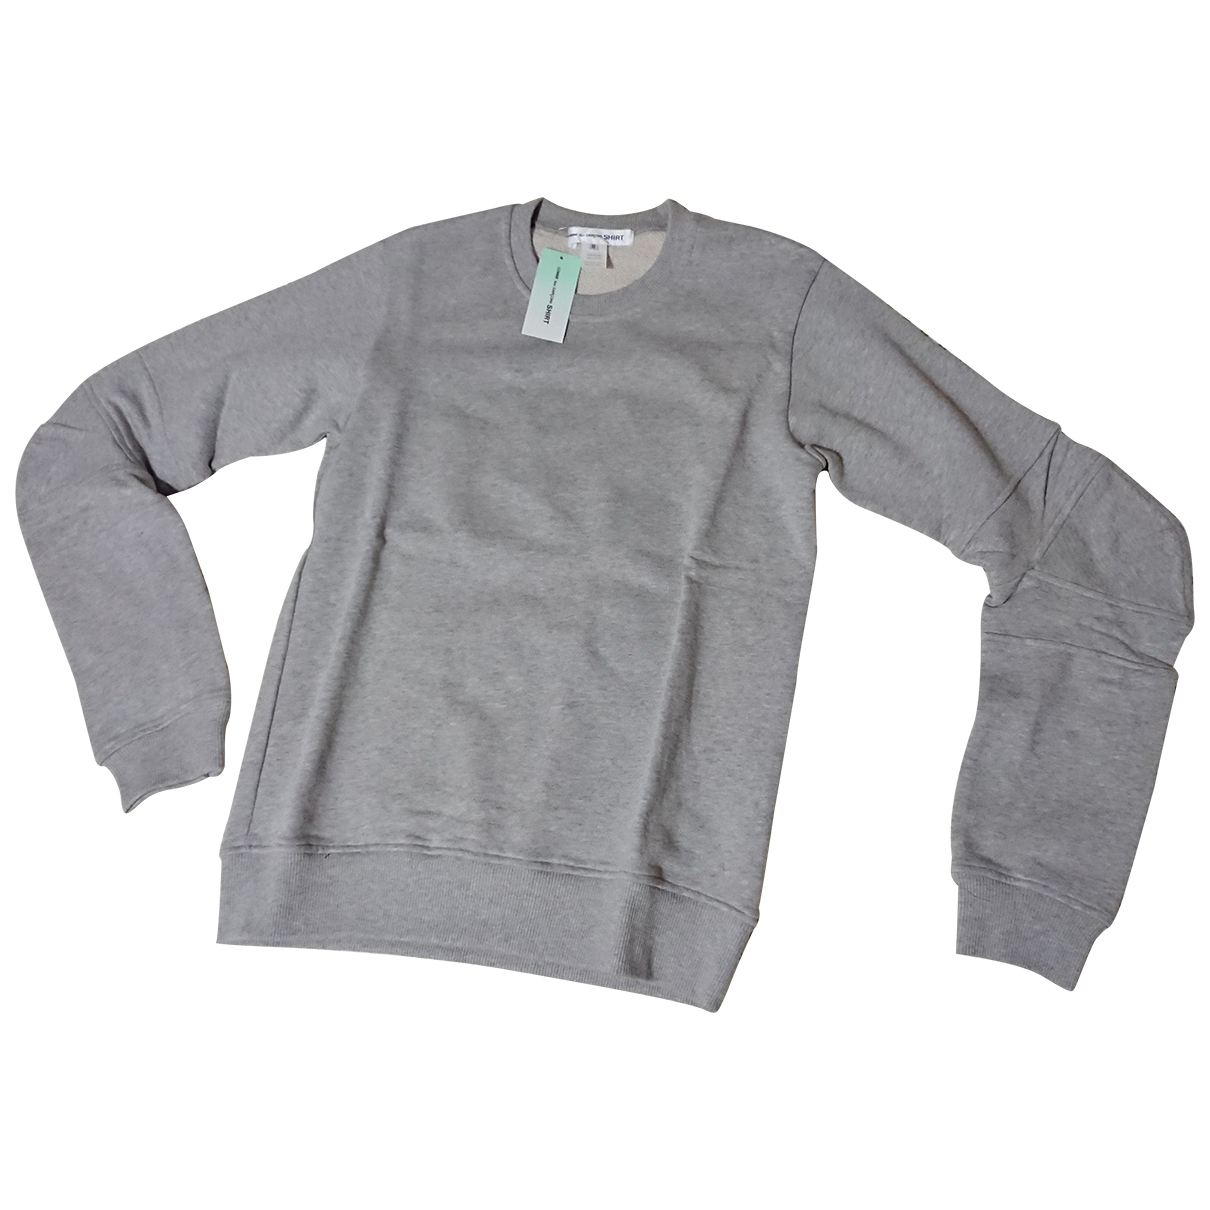 Comme Des Garcons \N Grey Cotton Knitwear & Sweatshirts for Men M International